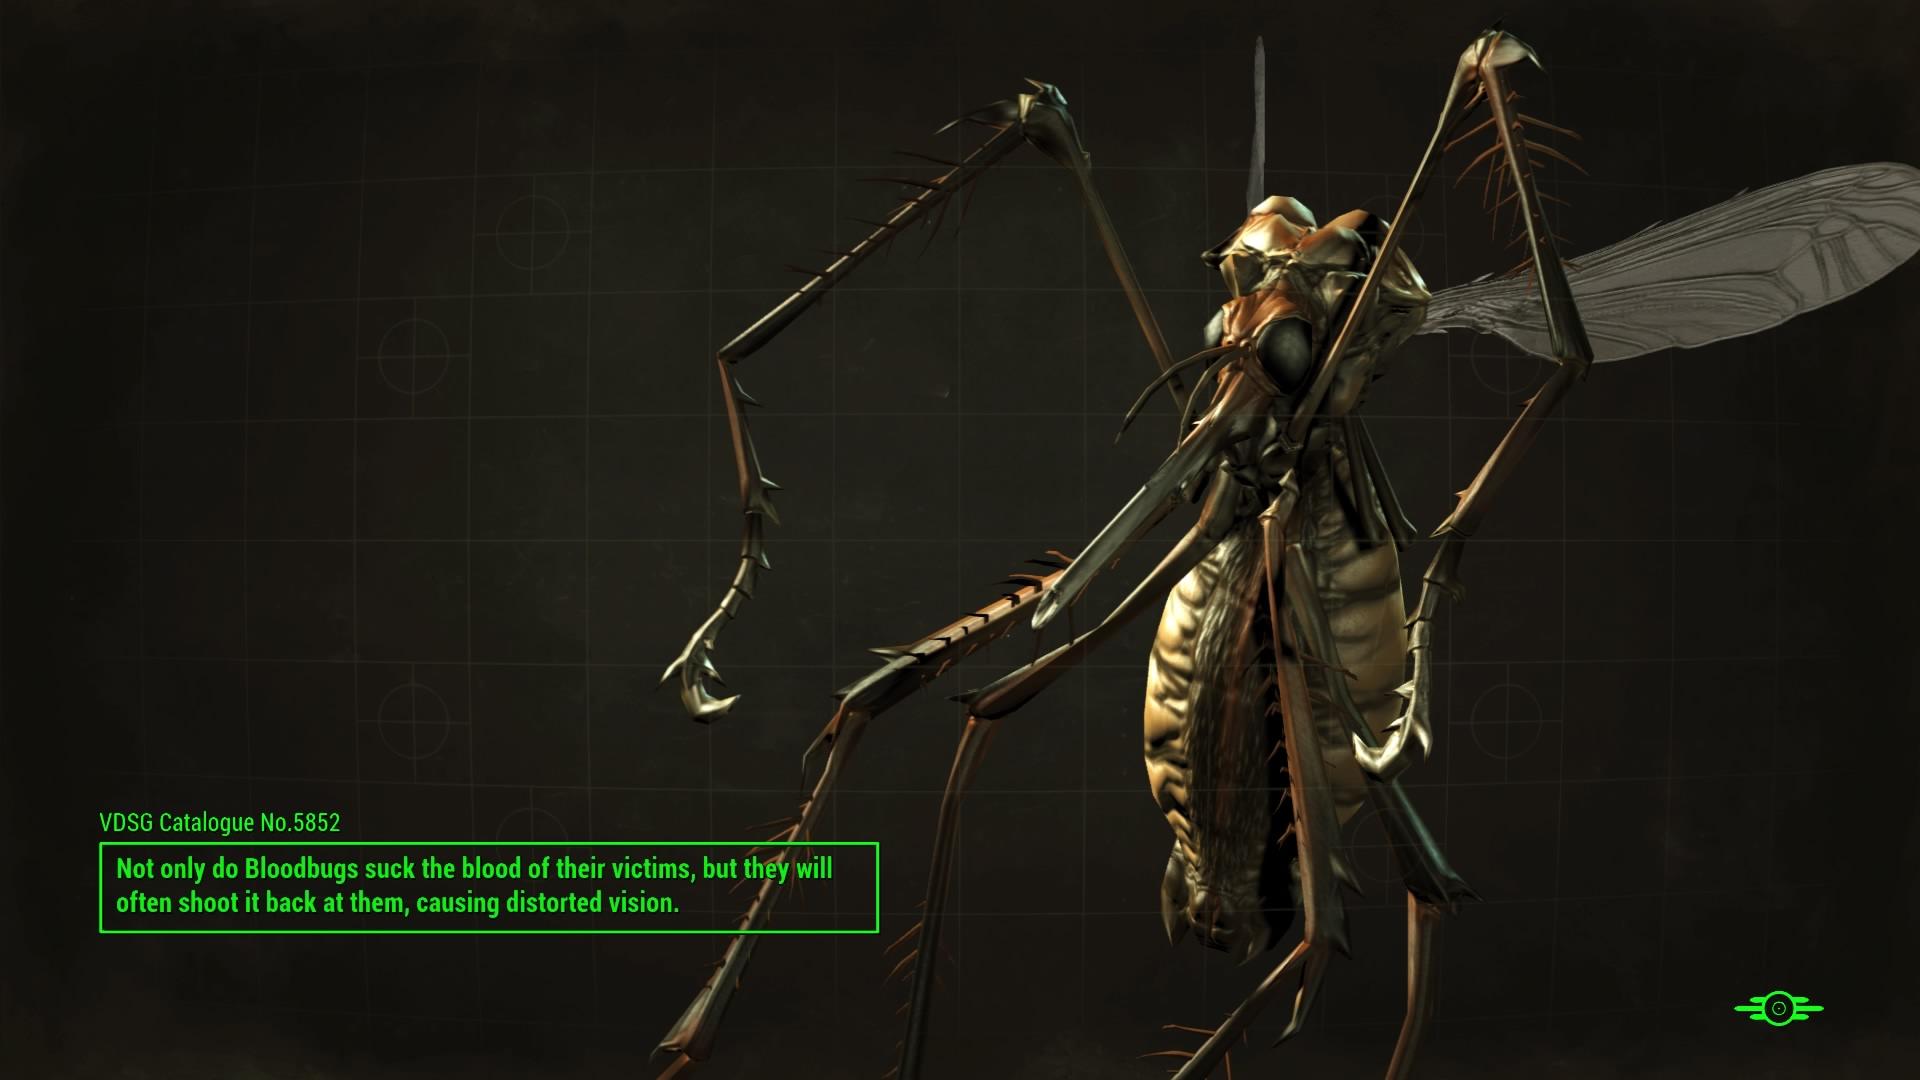 FO4 Bloodbug loading screen